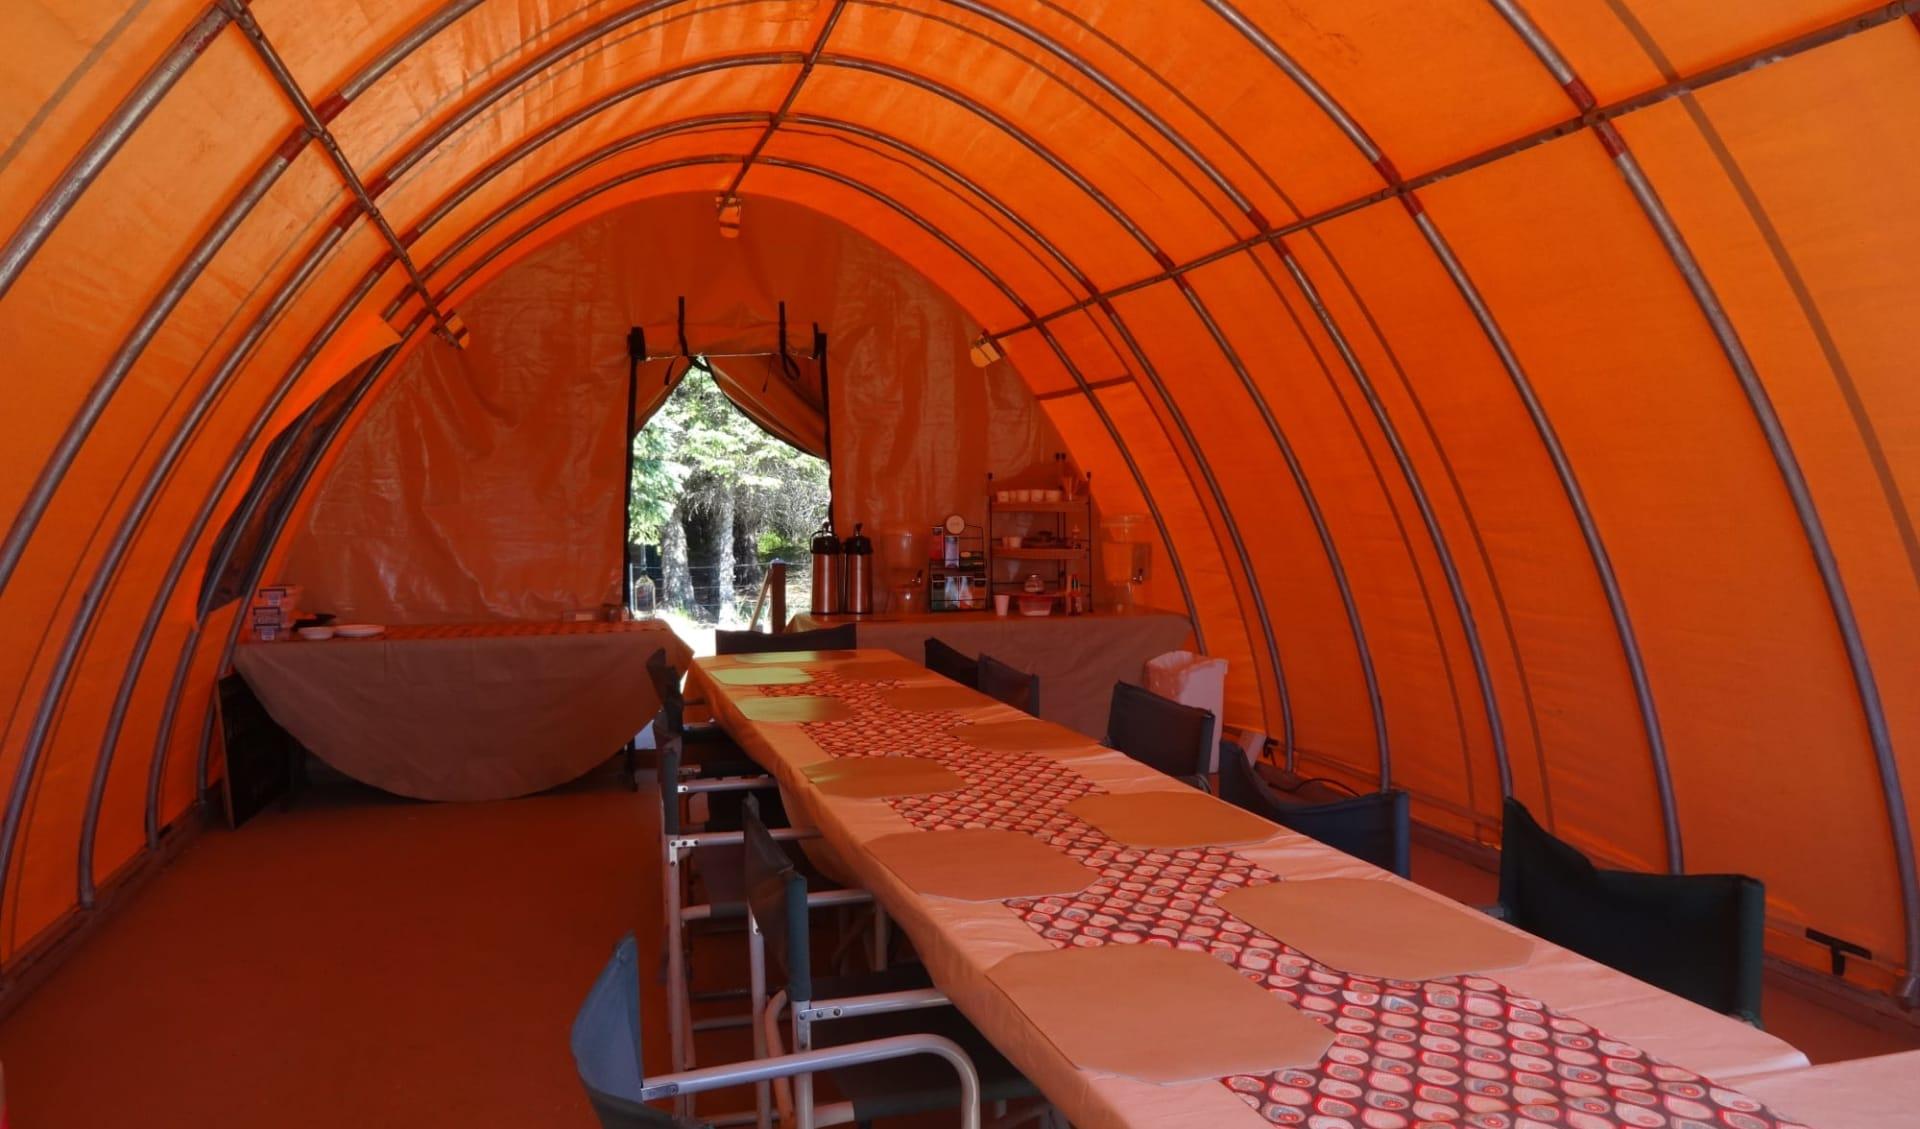 Bärenbeobachtung Great Alaska Bear Camp ab Anchorage: f&b: Great Alaska Bear Camp_Dining Tent